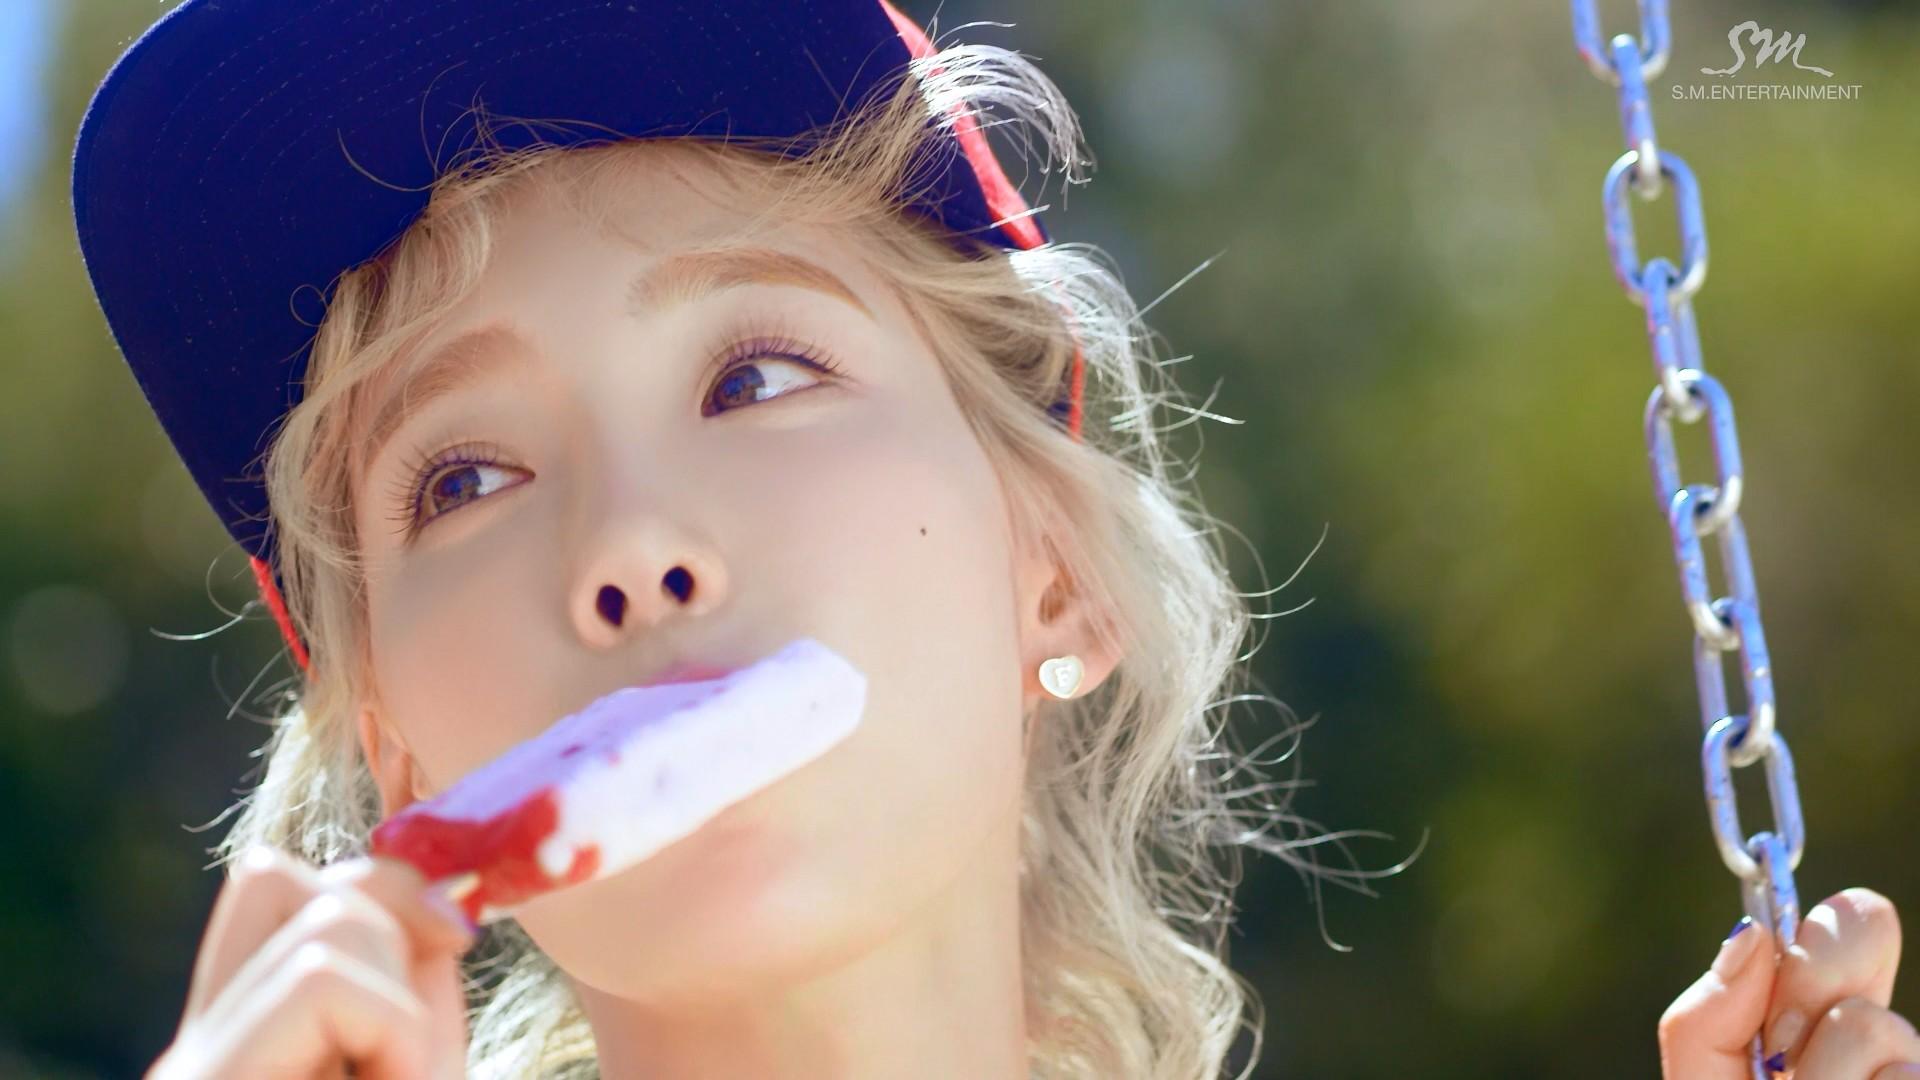 [MV] Taeyeon – Why [Bugs! HD 1080p]